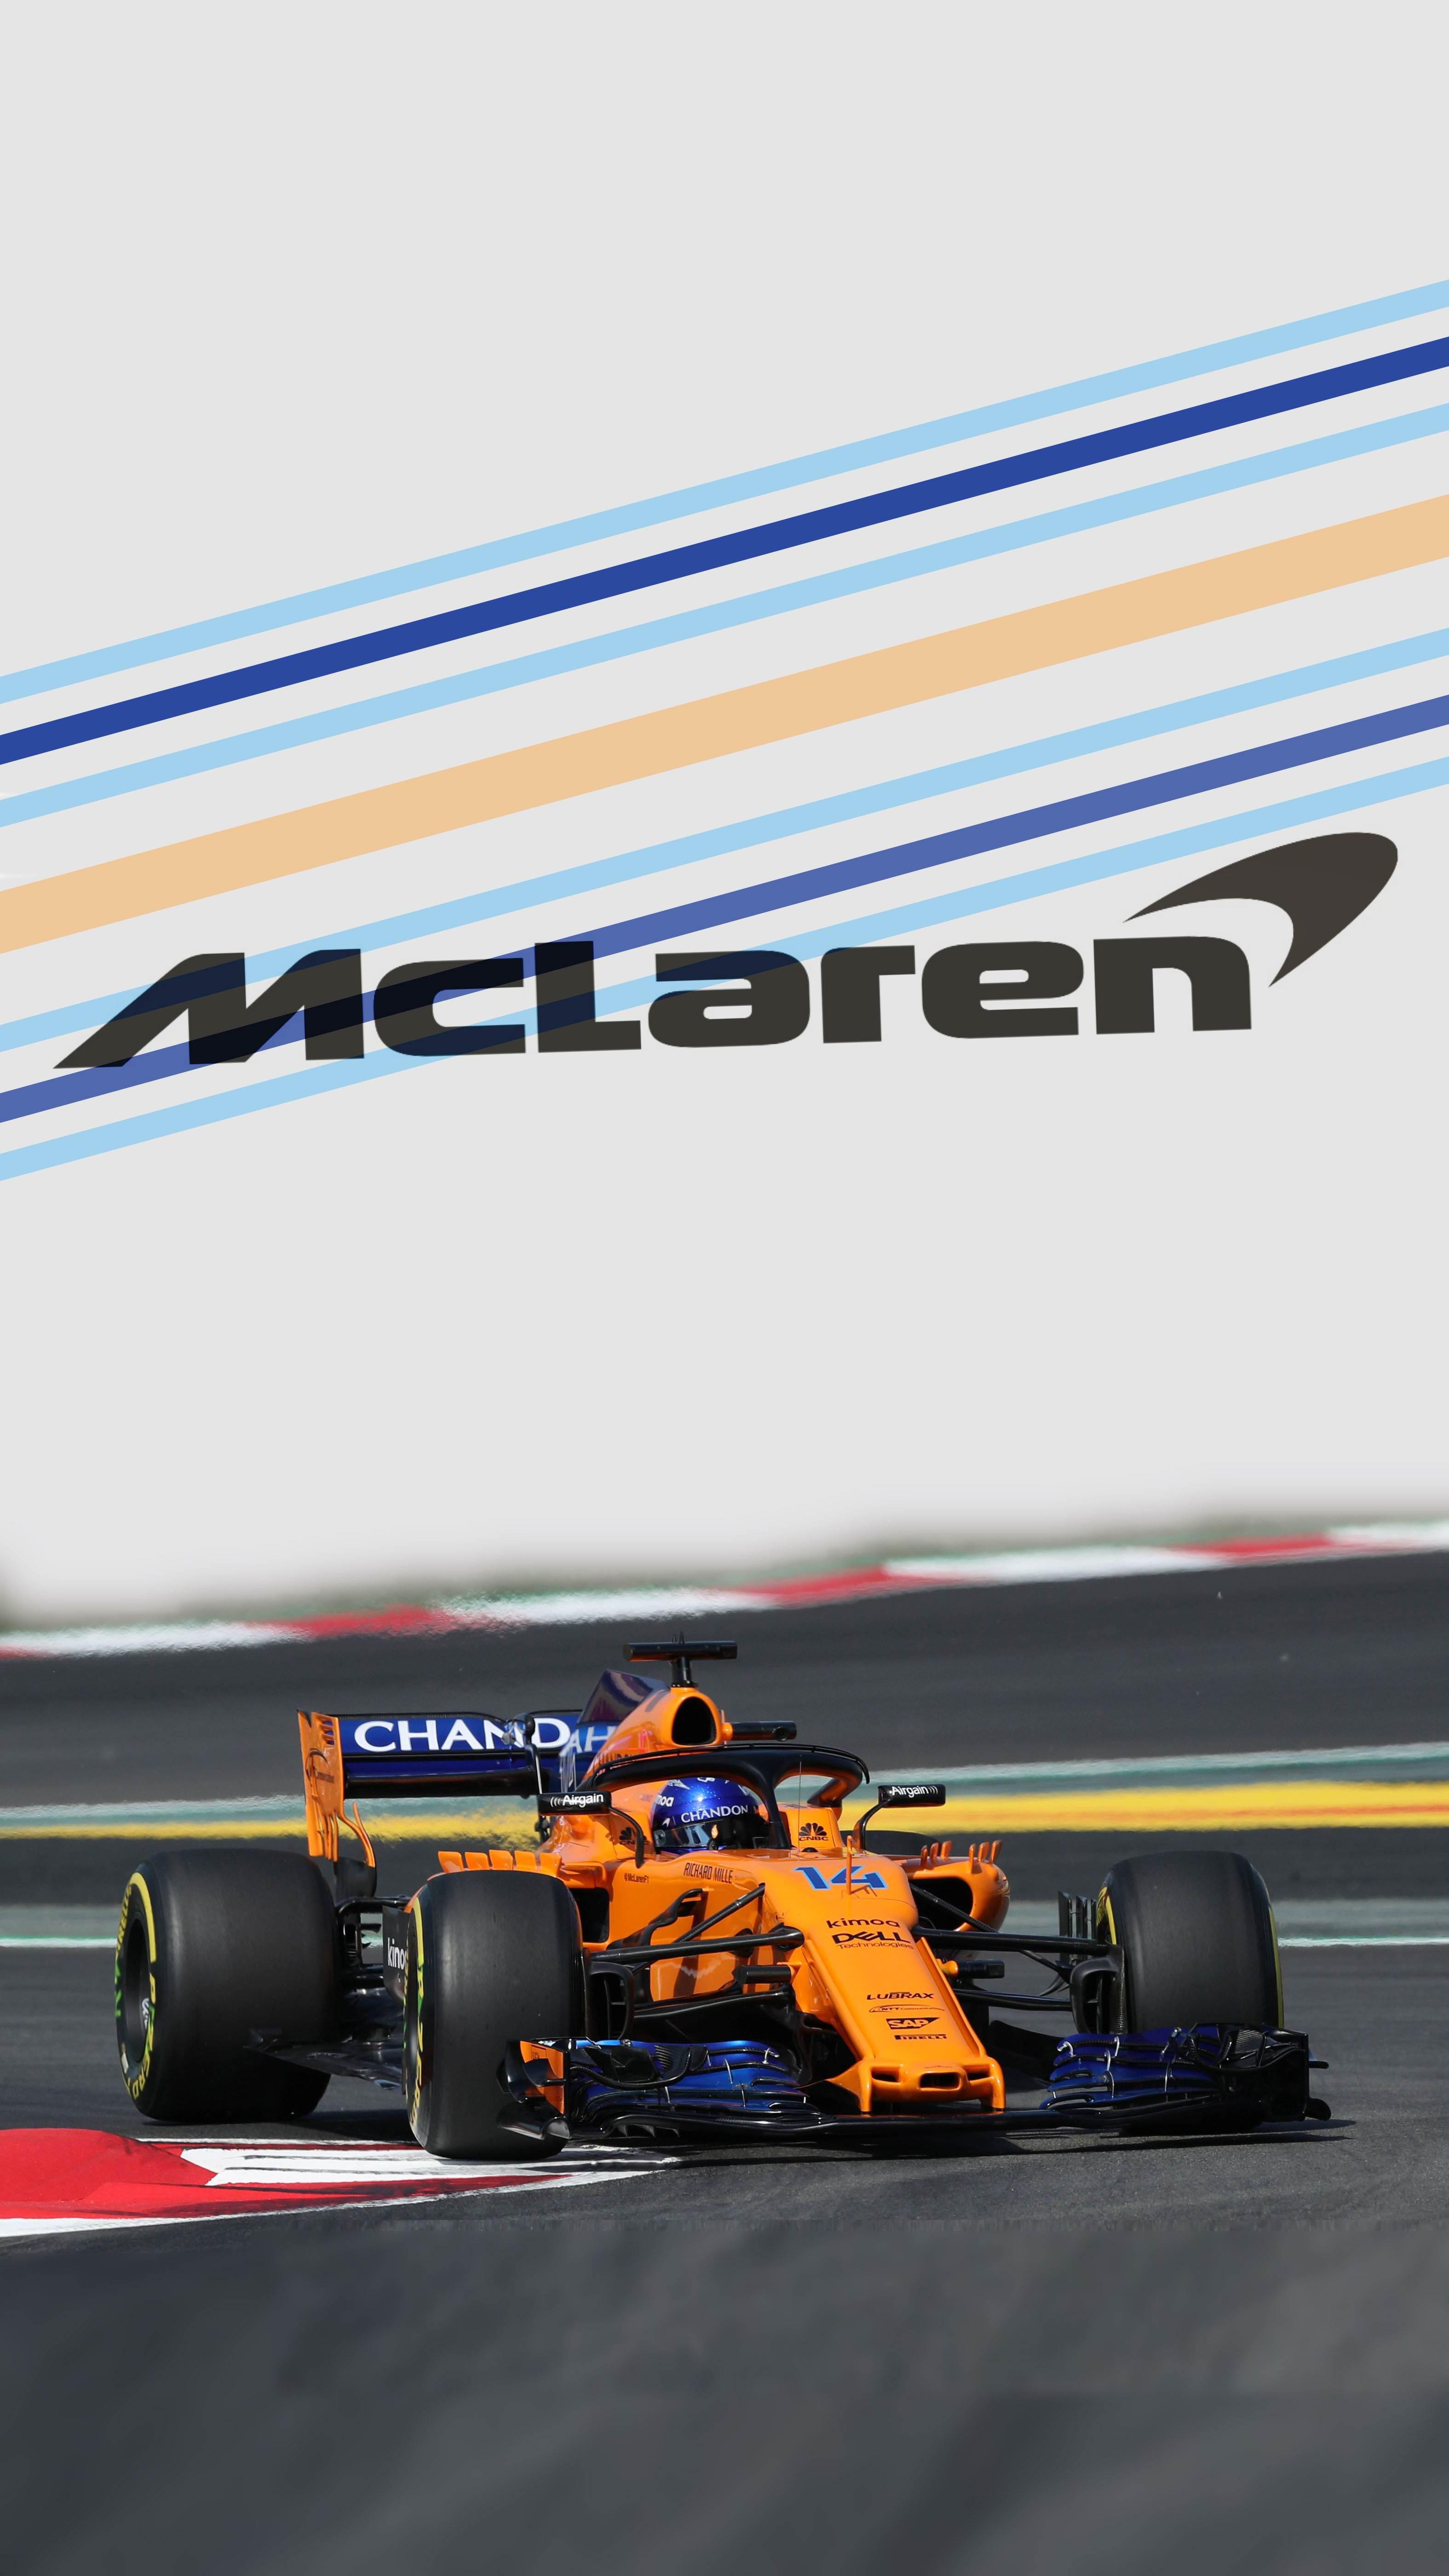 download Mclaren Formula 1 2019 Wallpaper [3150x5600] for 3150x5600